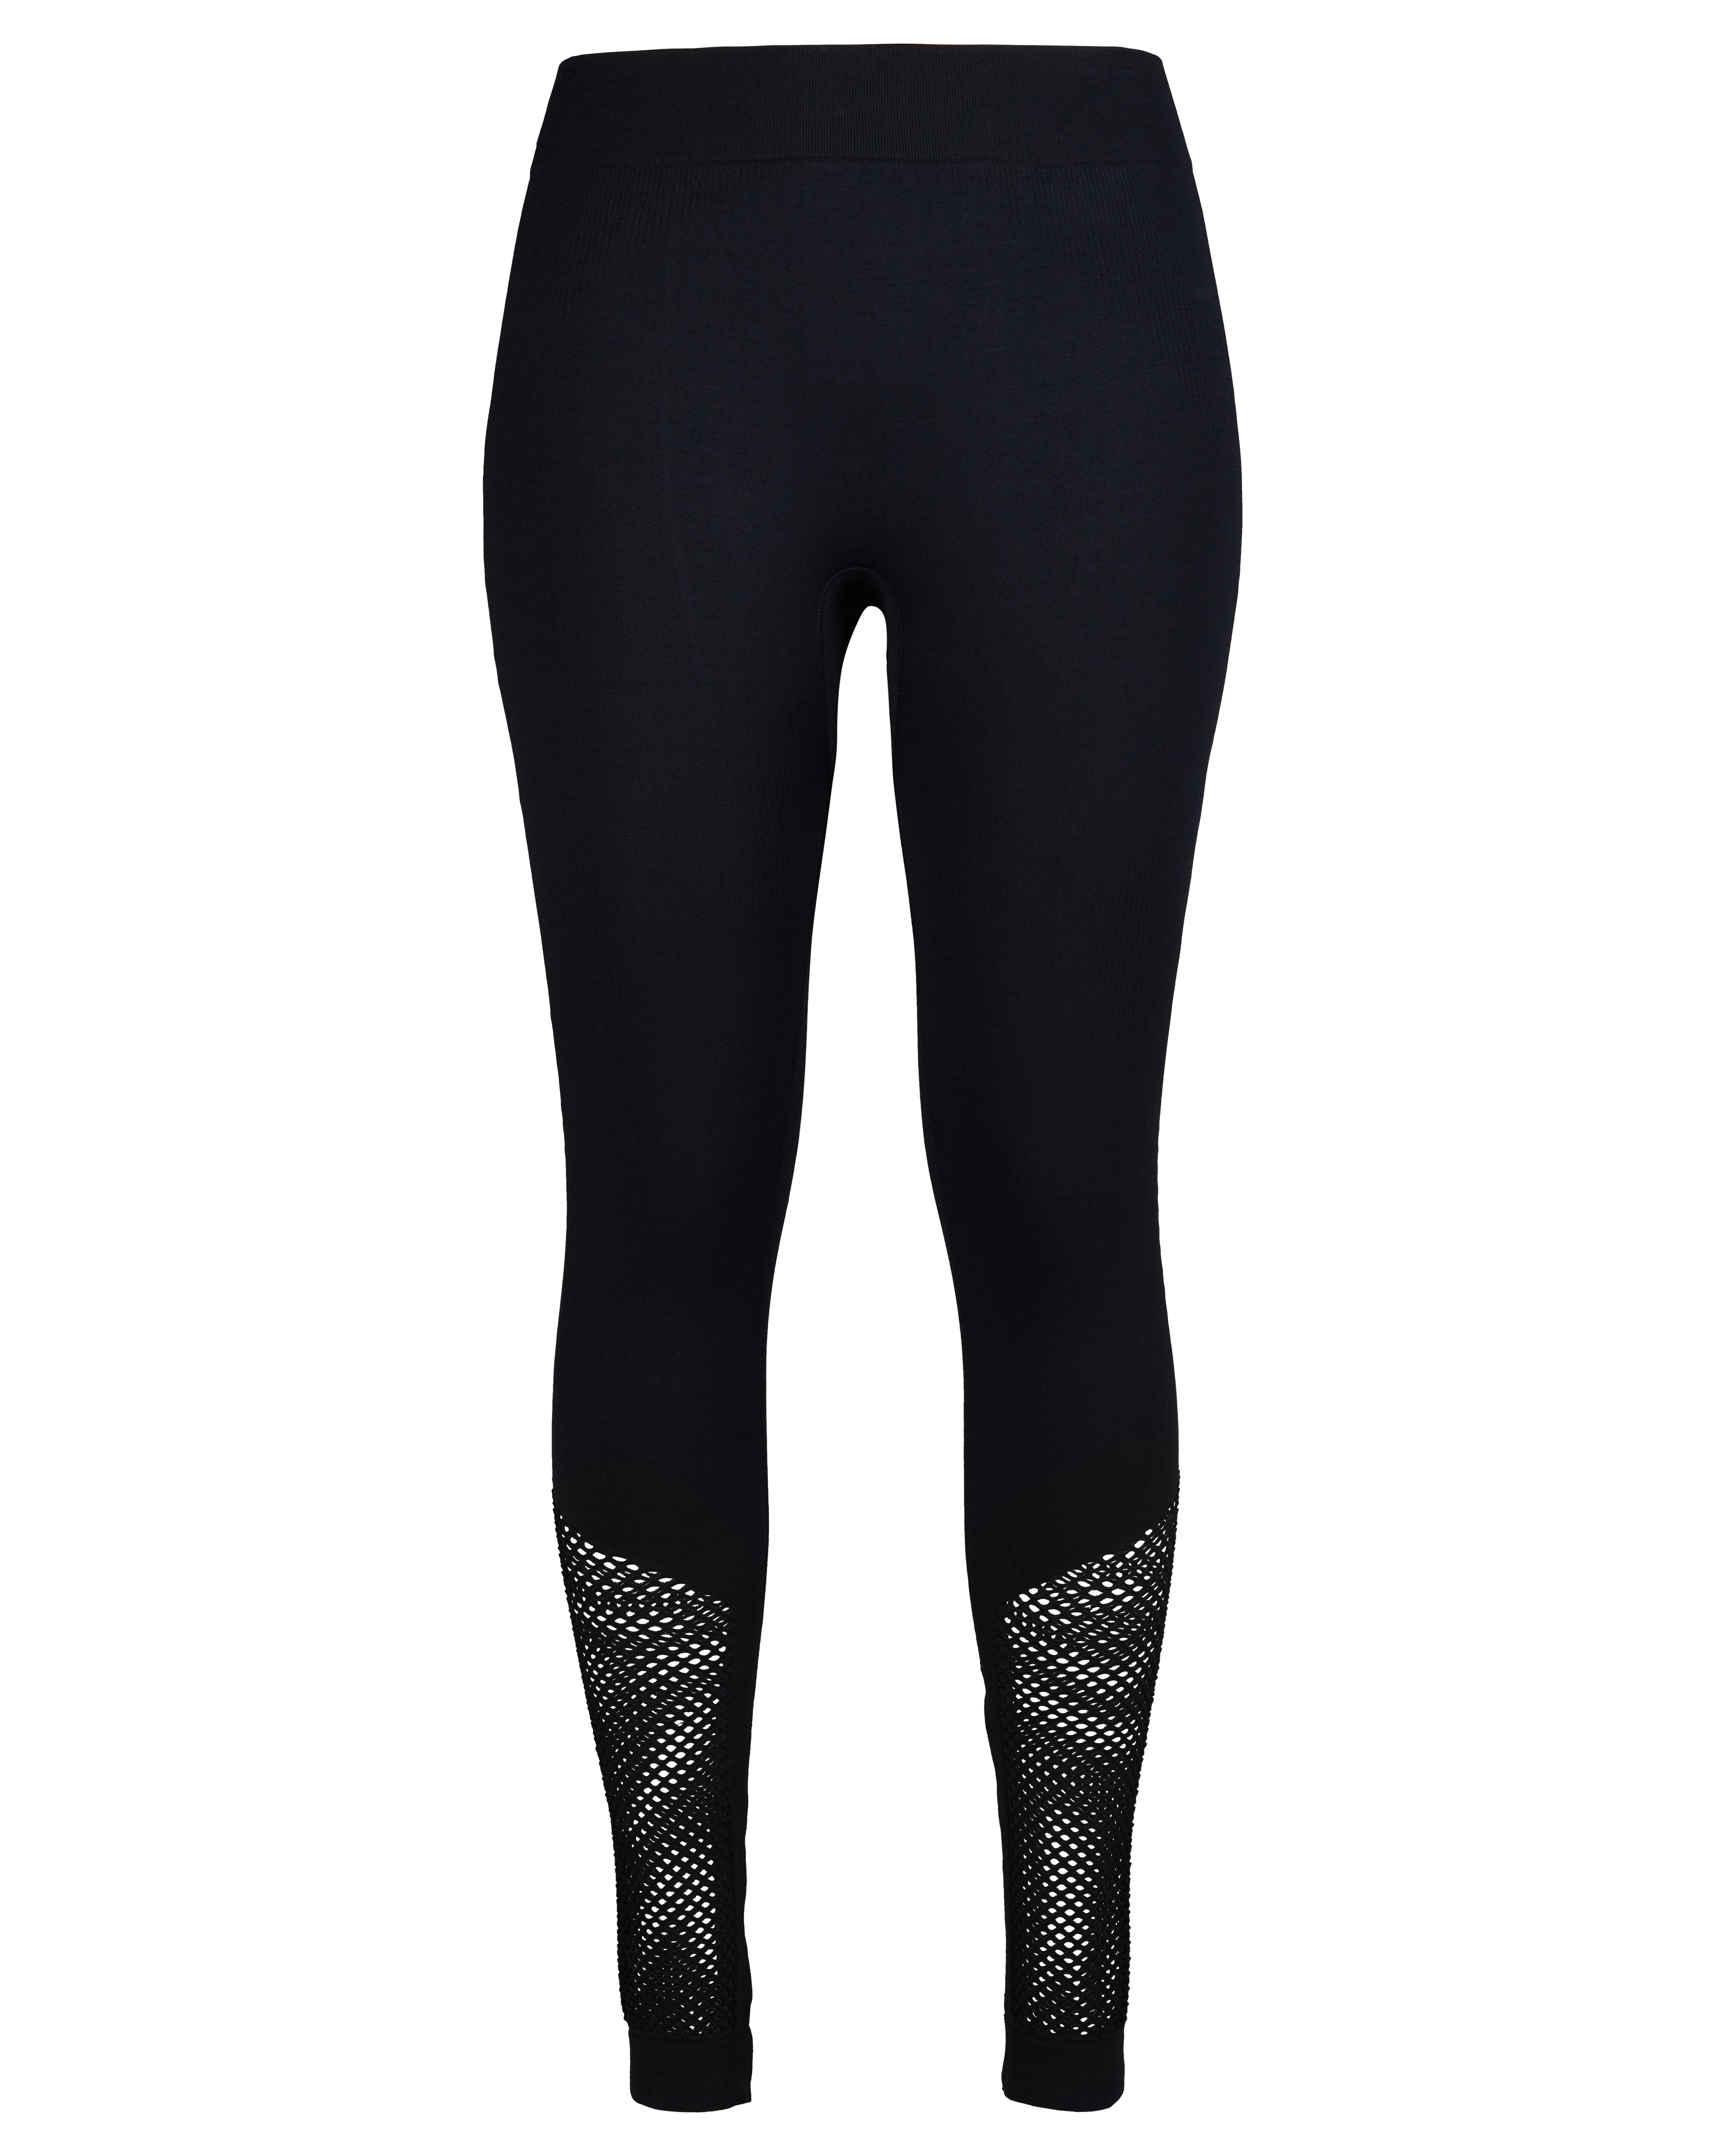 Skiny L. Long Running Tight - Black